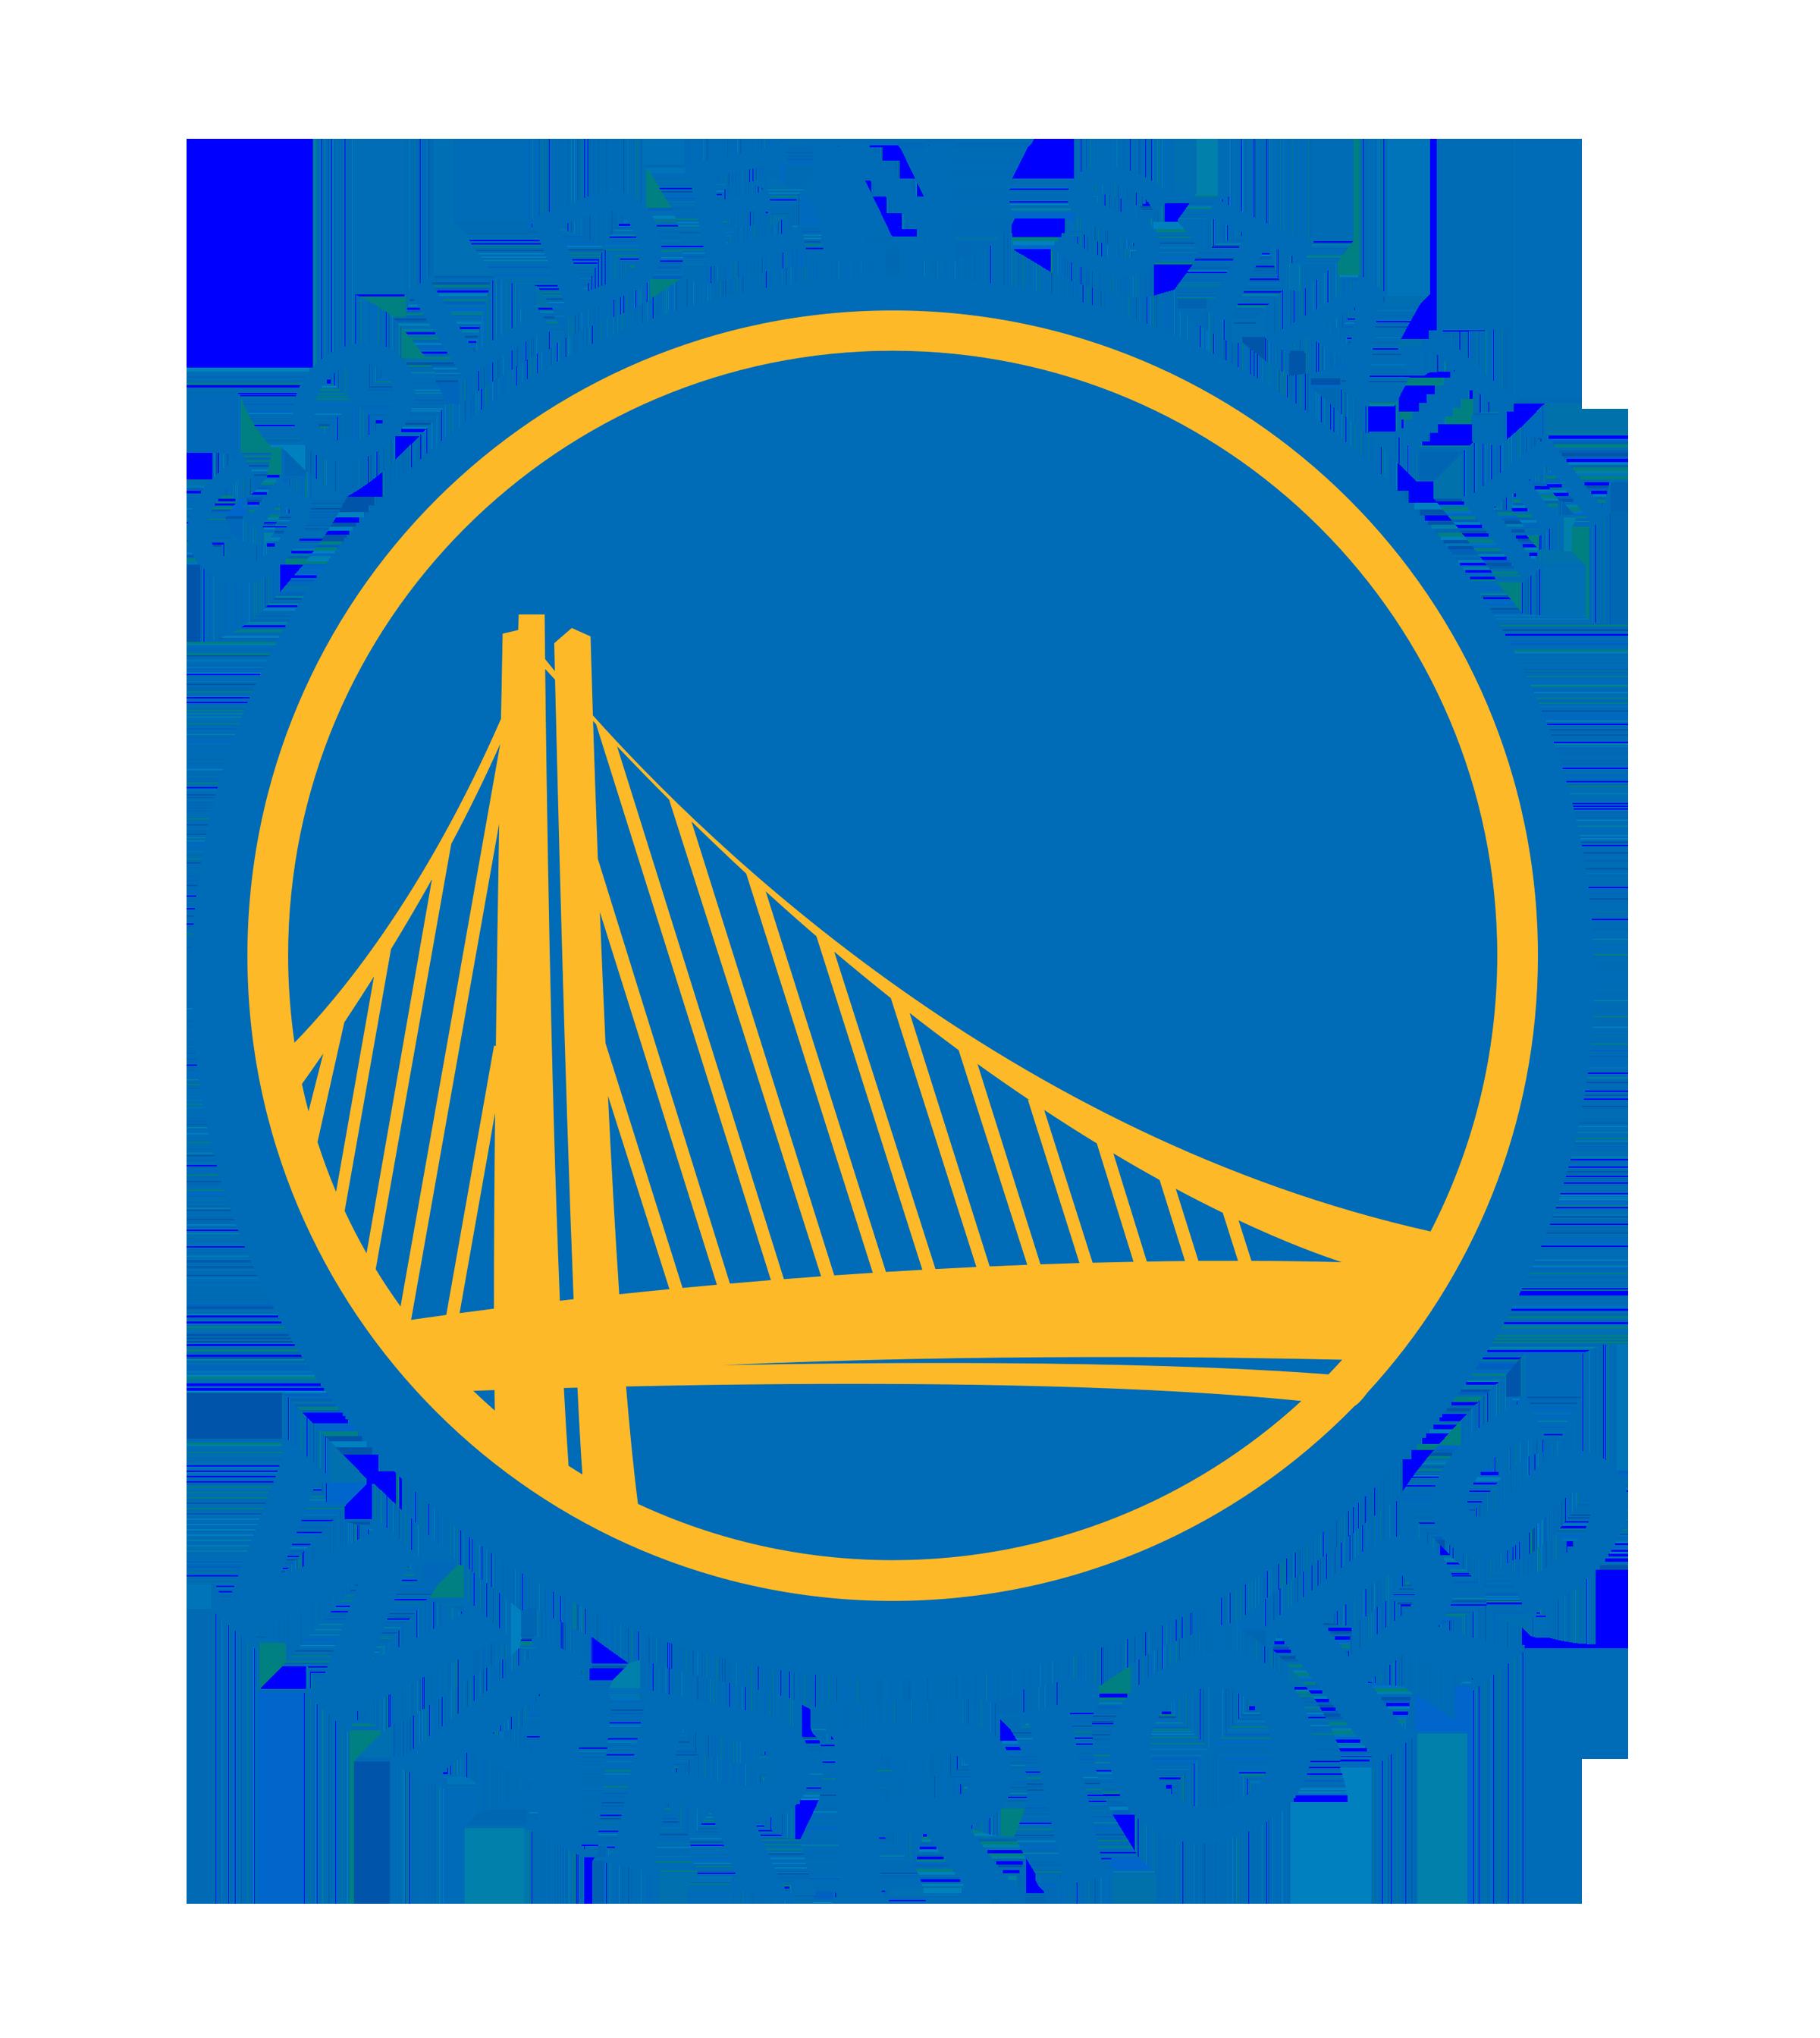 Golden State warriors logo transparent Golden state